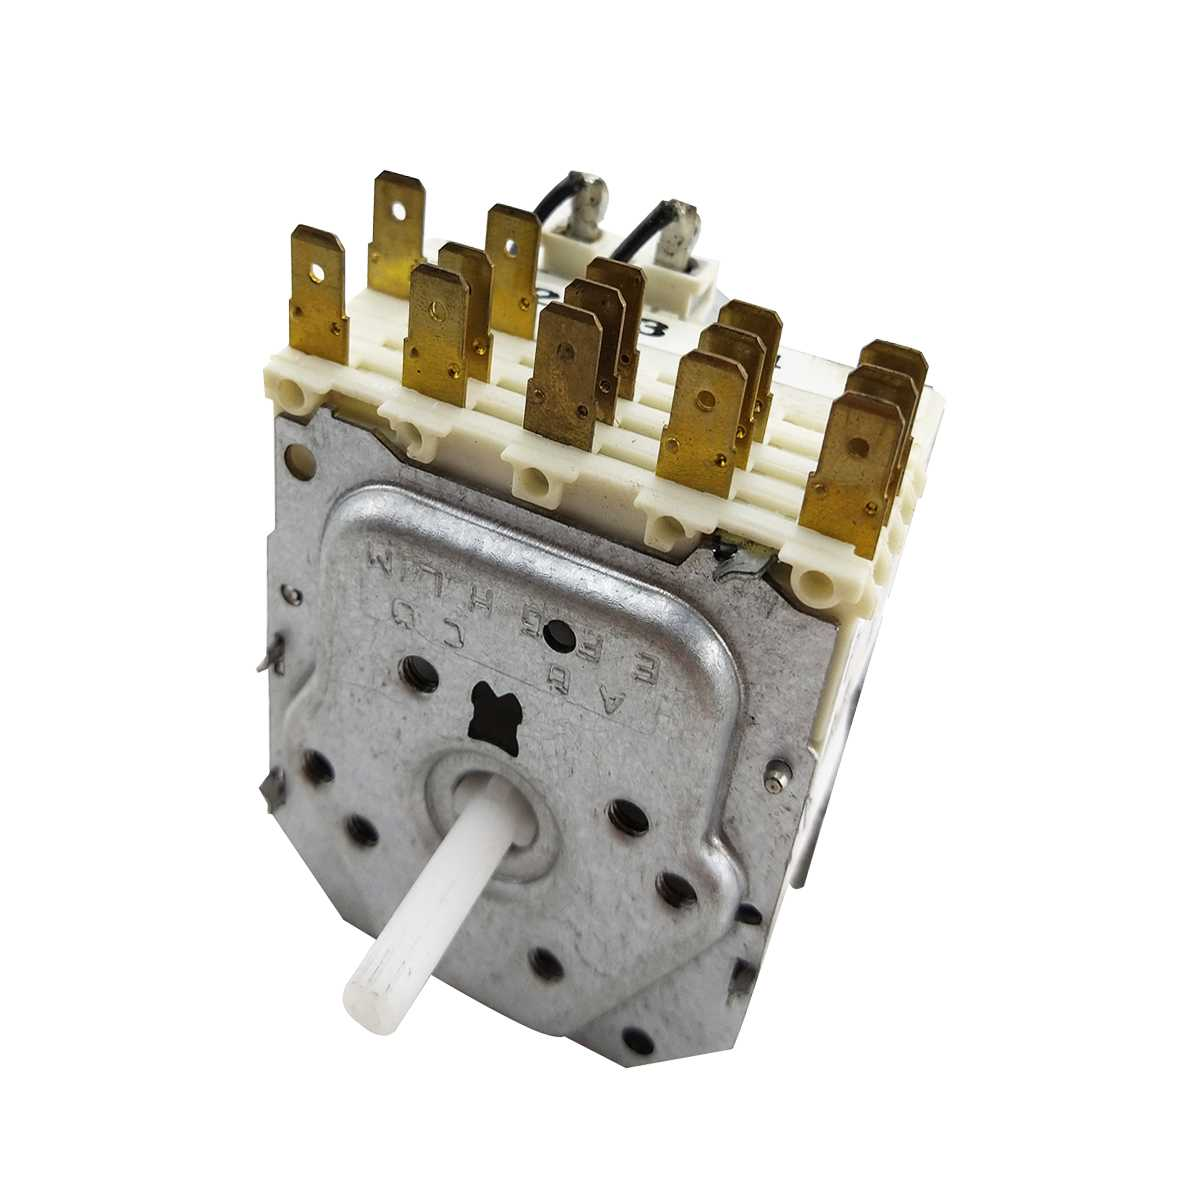 Timer da lavadora de roupa Electrolux 220v 64590692 LF90, LM08, LM08A, TOP26, LQ90